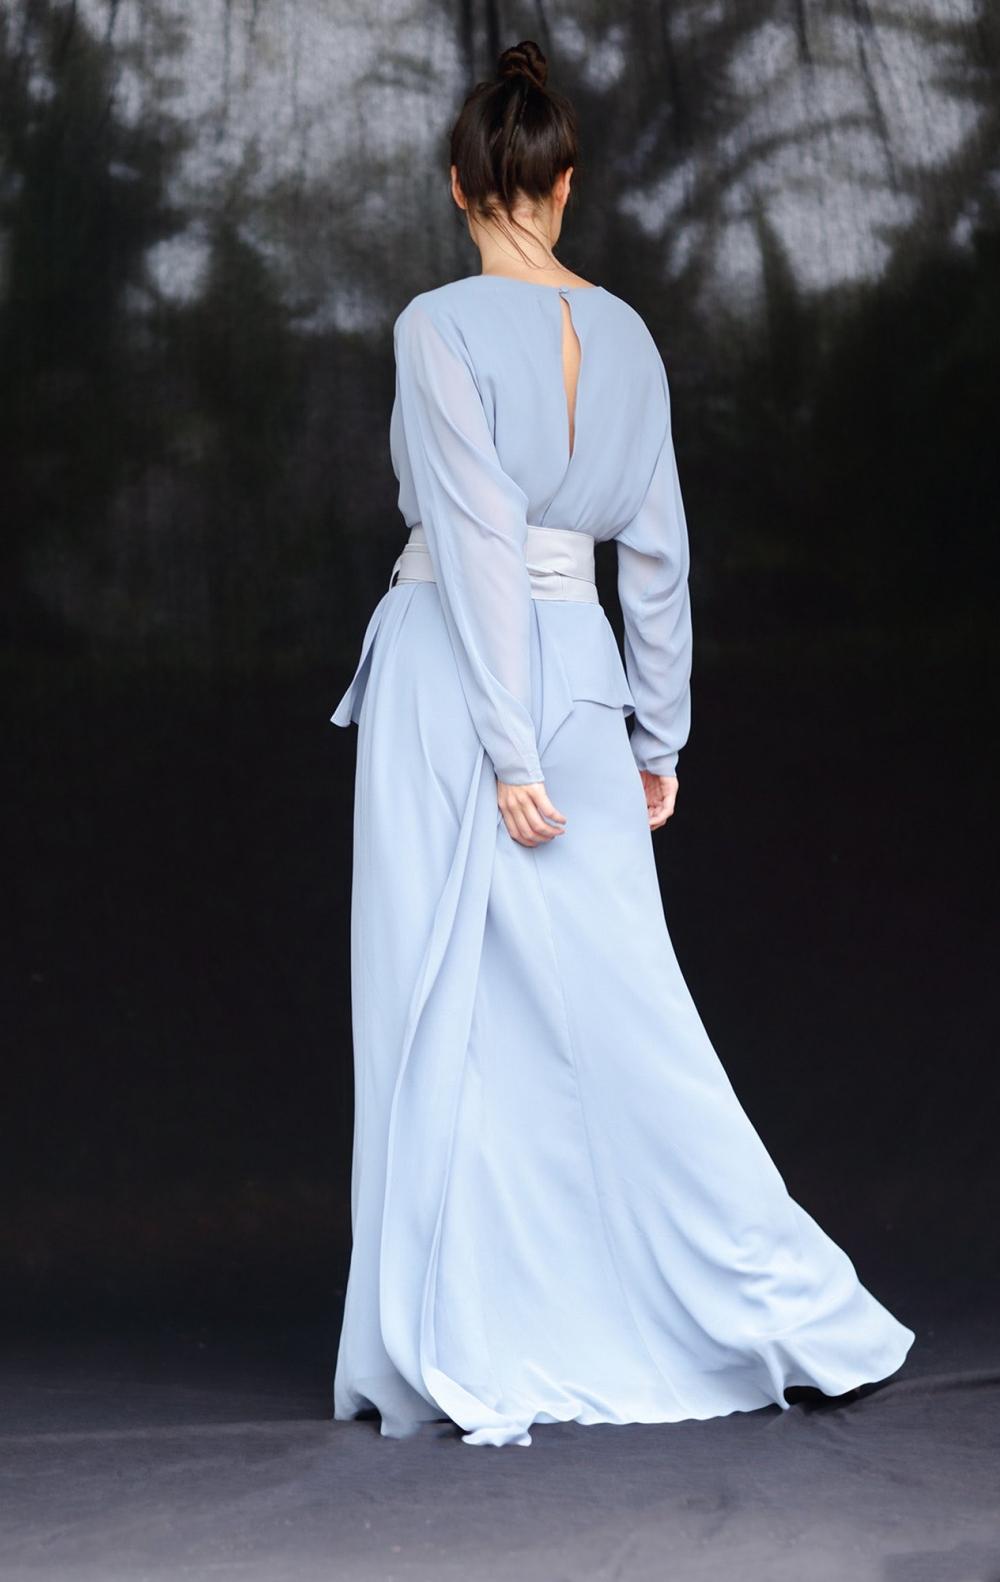 Vestido Musseline Festa Azul Claro  - Foto 4